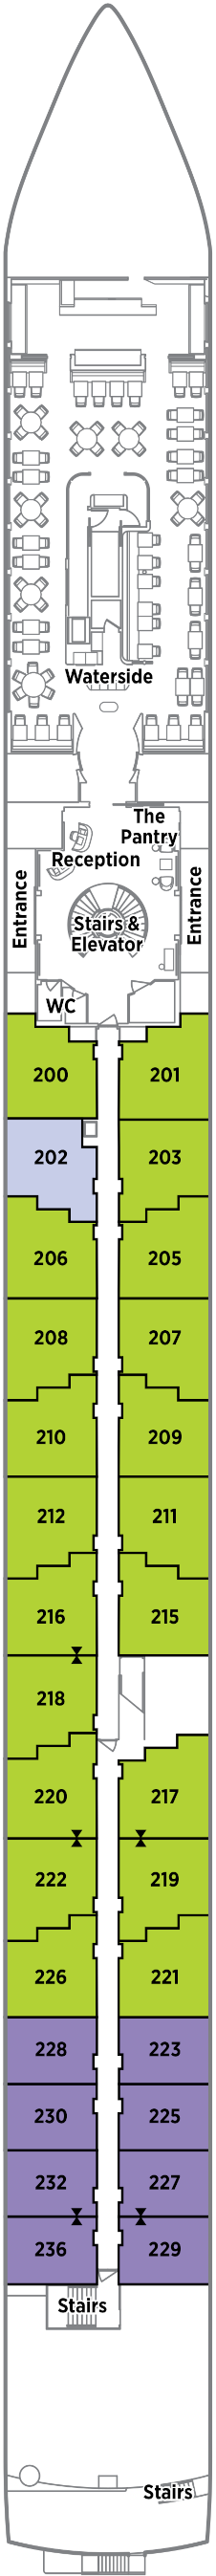 Crystal Ravel Seahorse Deck Deck Plan